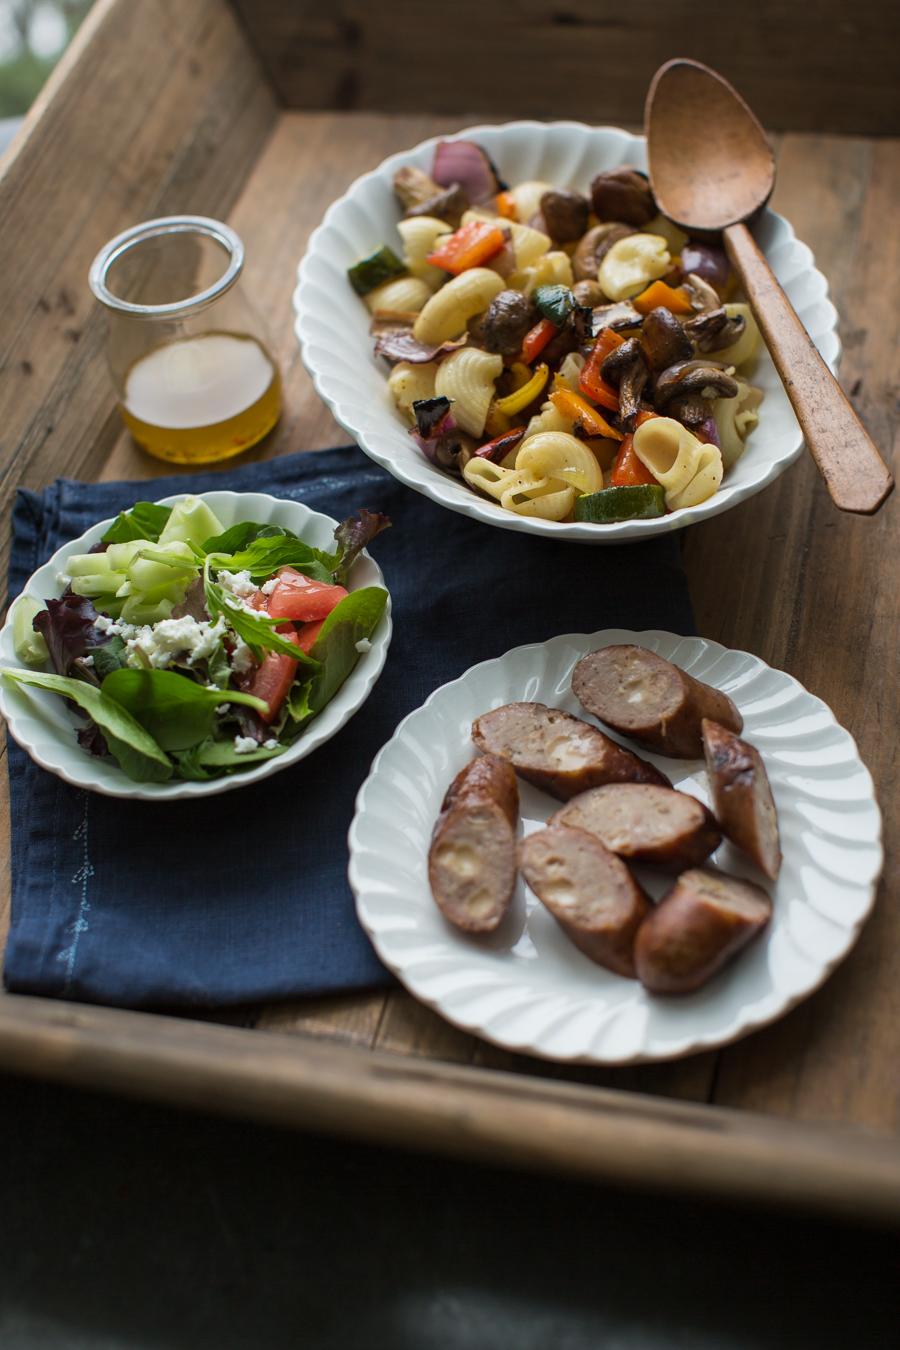 heinens_4pmpanic_roasted_Veg_sausage-5002